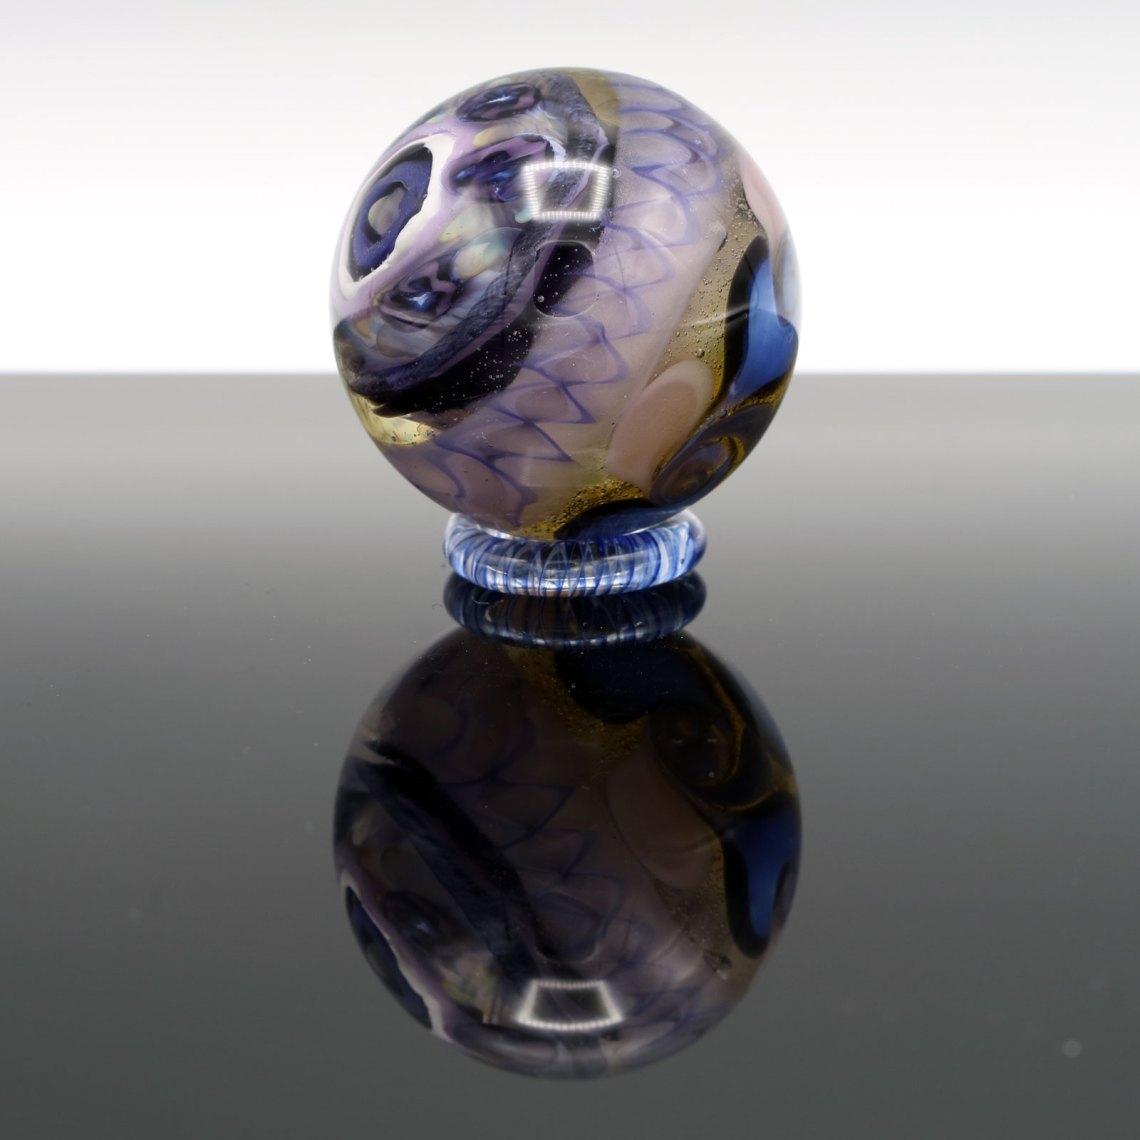 Shana Glassgirl – Large Trippy Marble